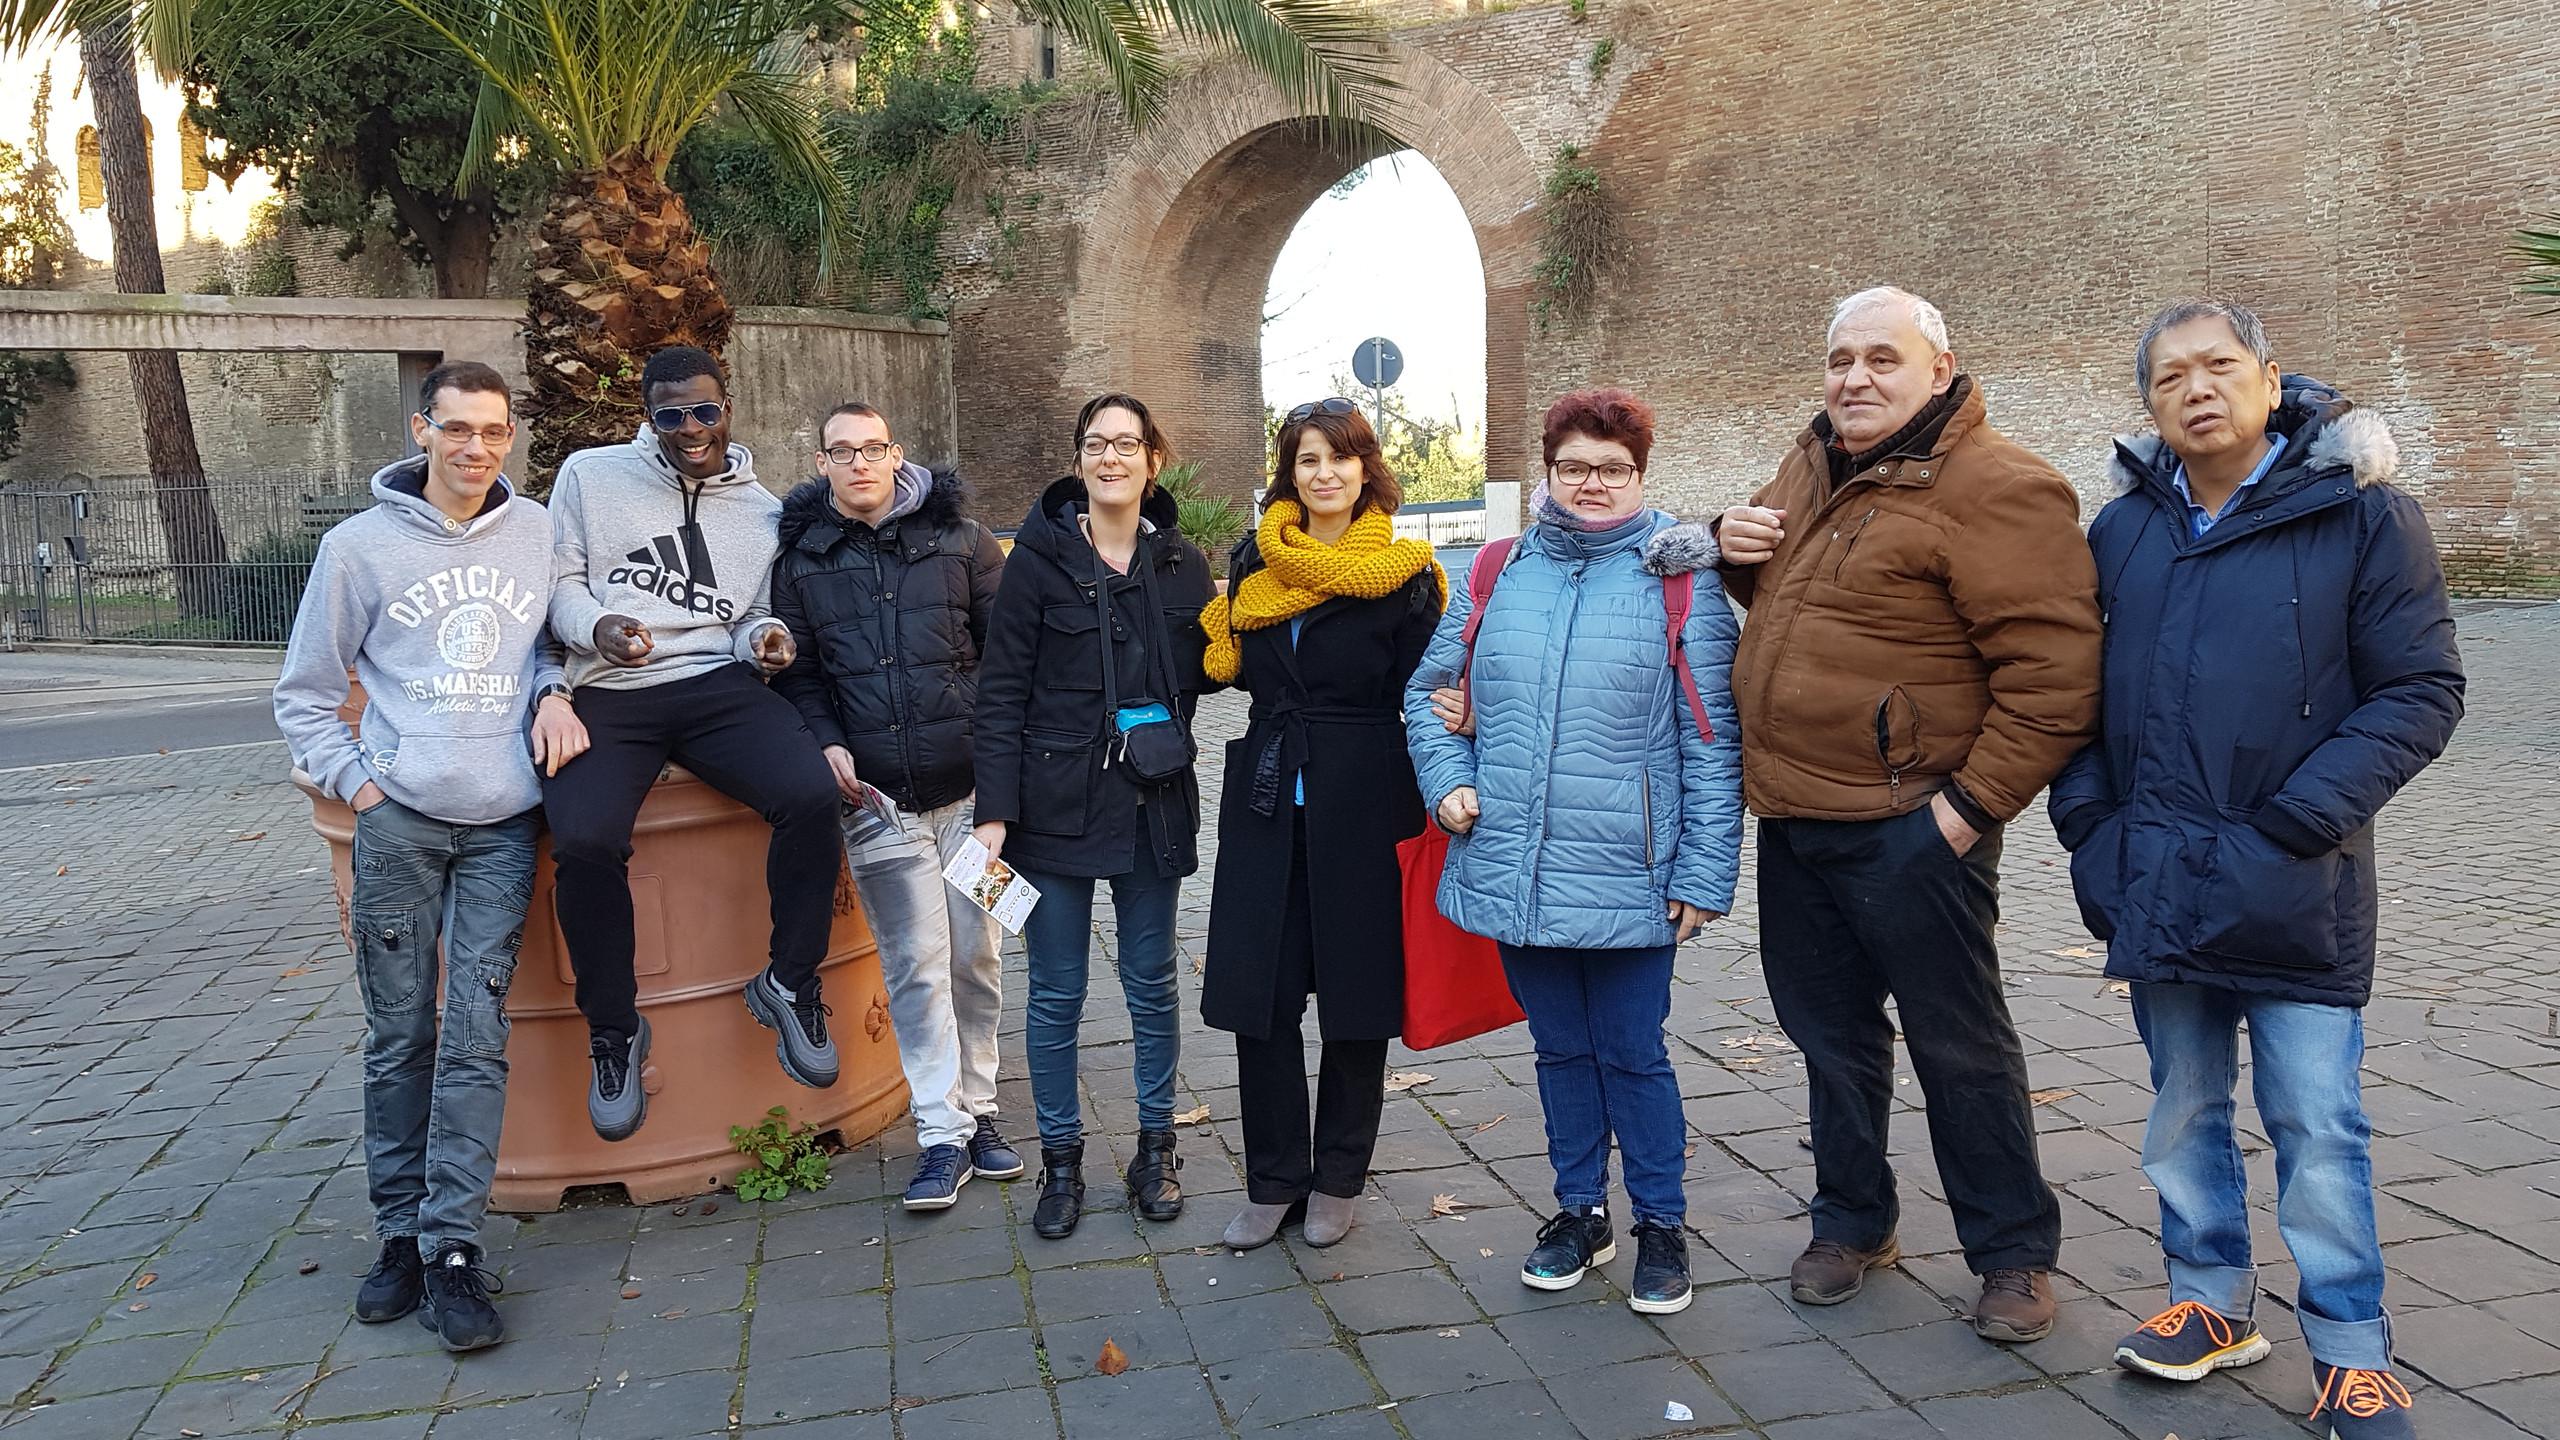 Séjour rome 2018 - 2019 (49)